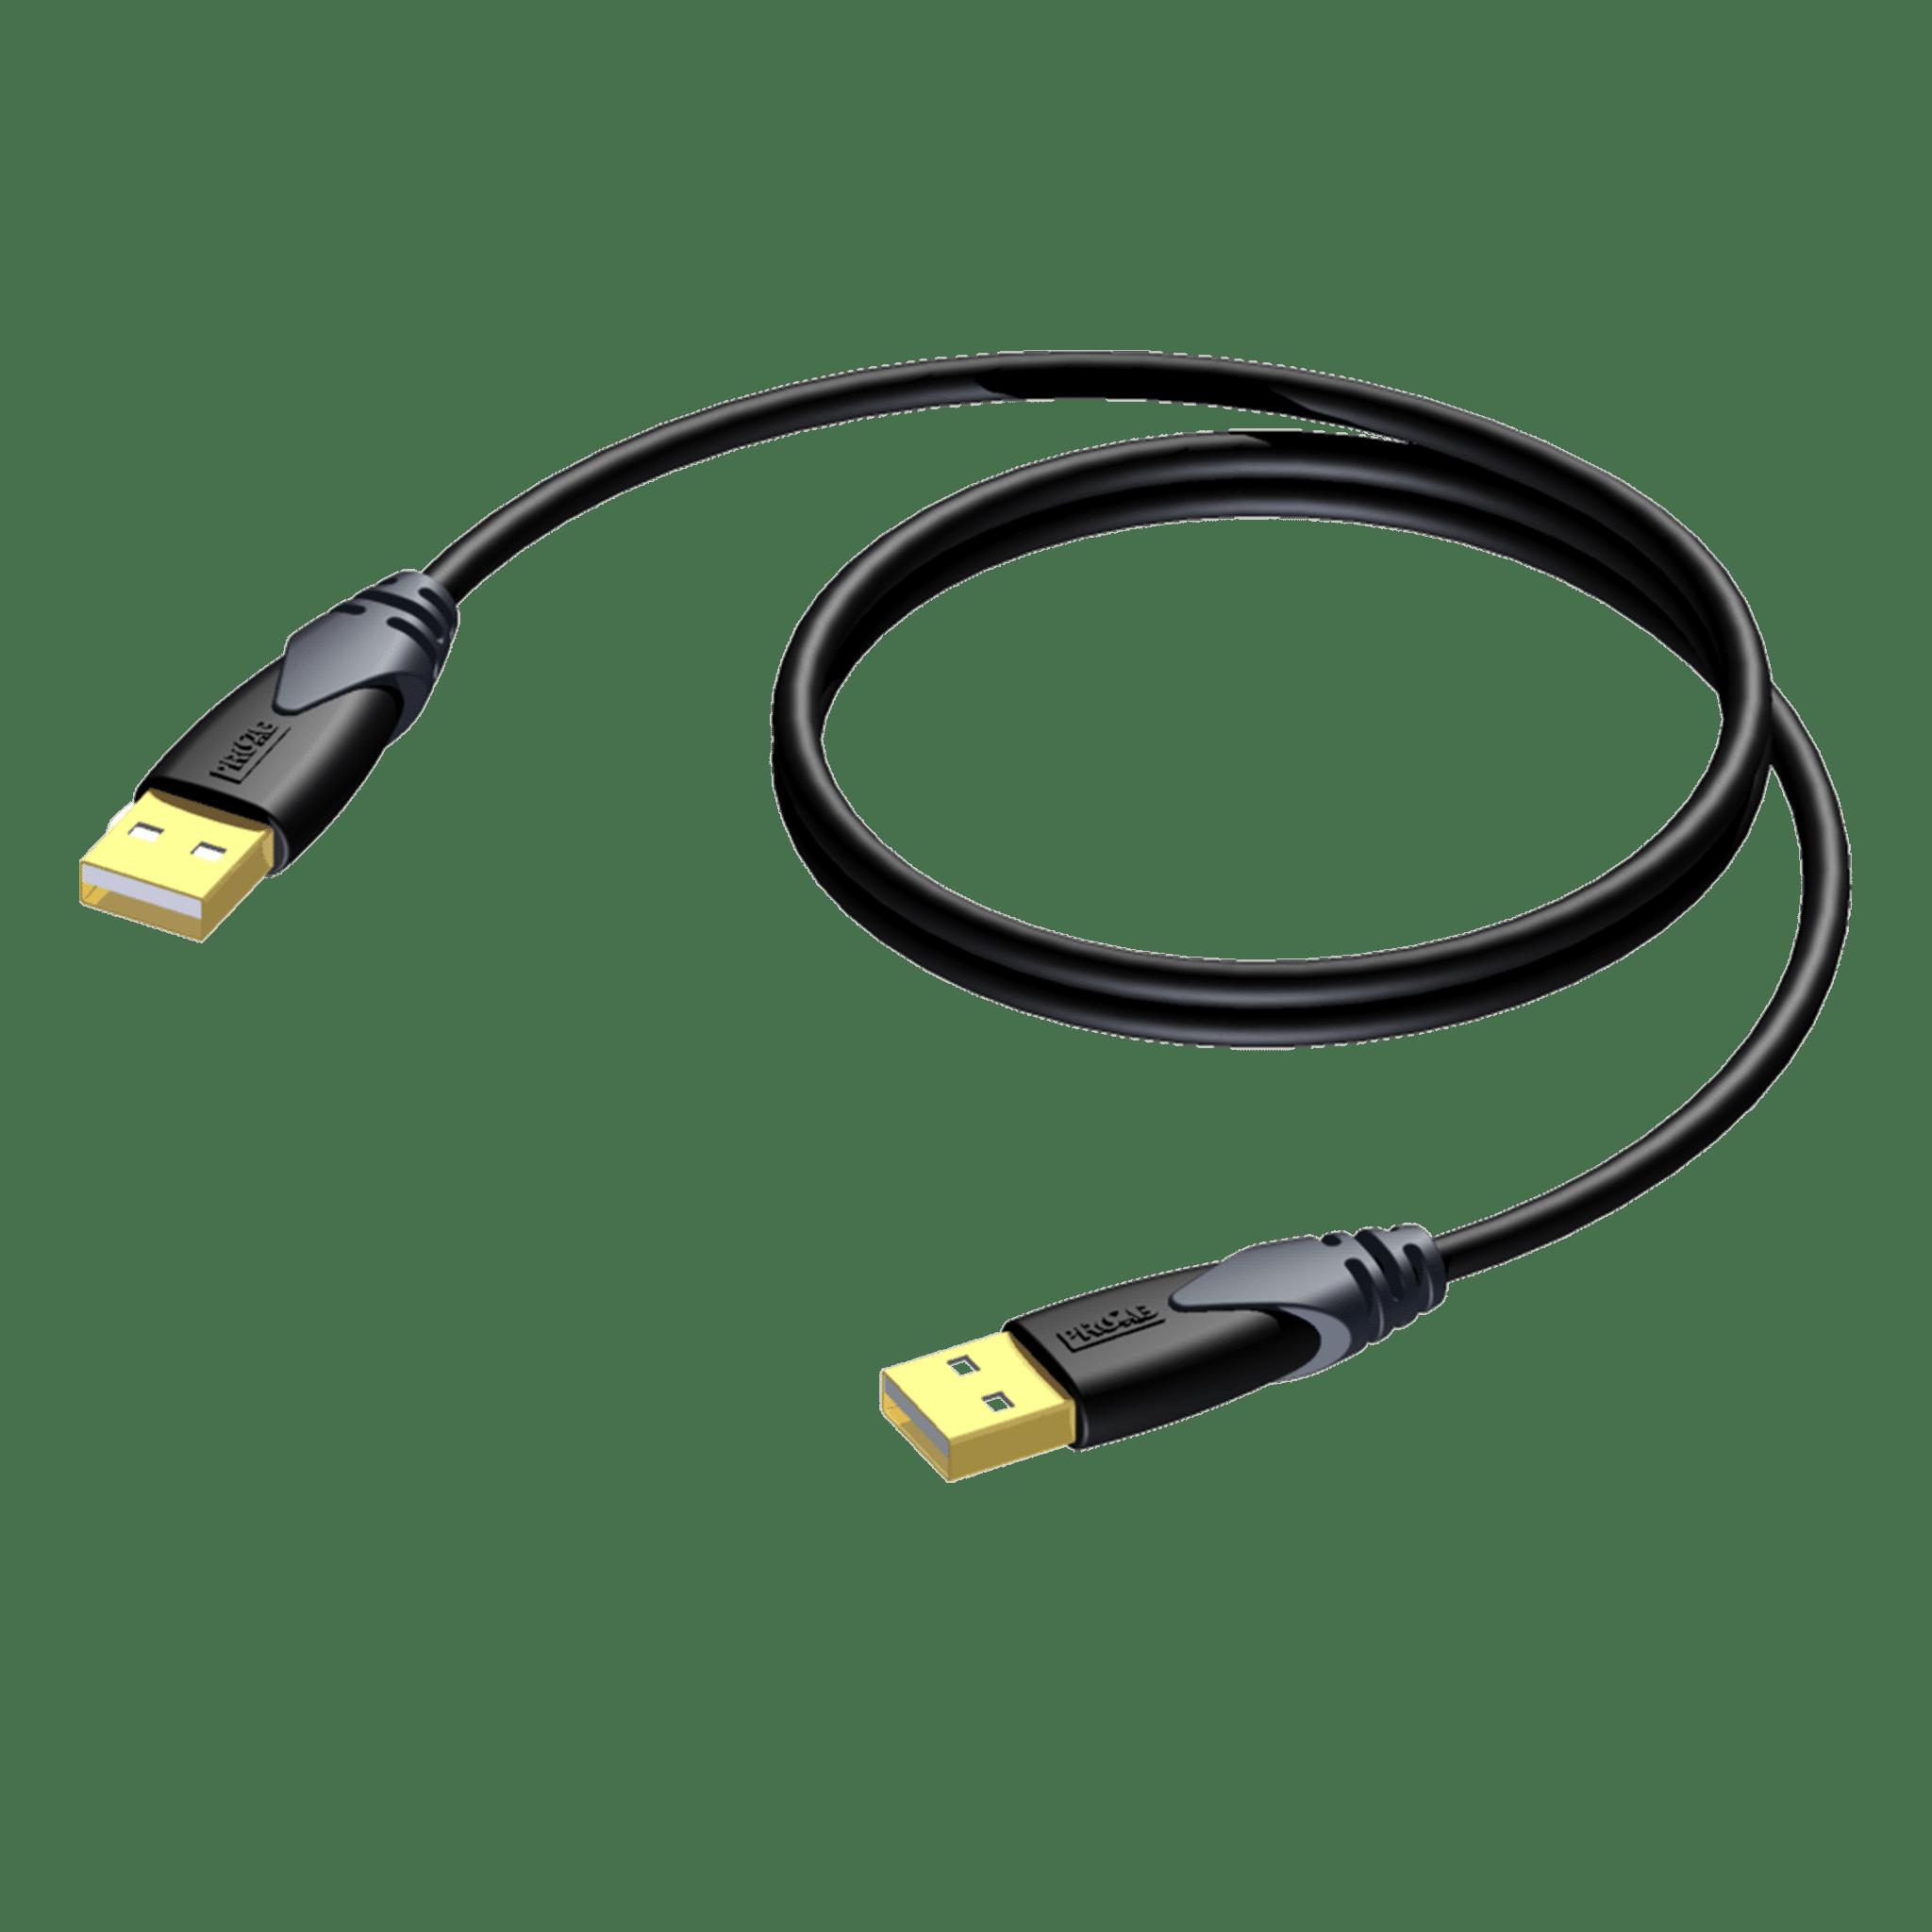 CLD600 - USB A - USB A